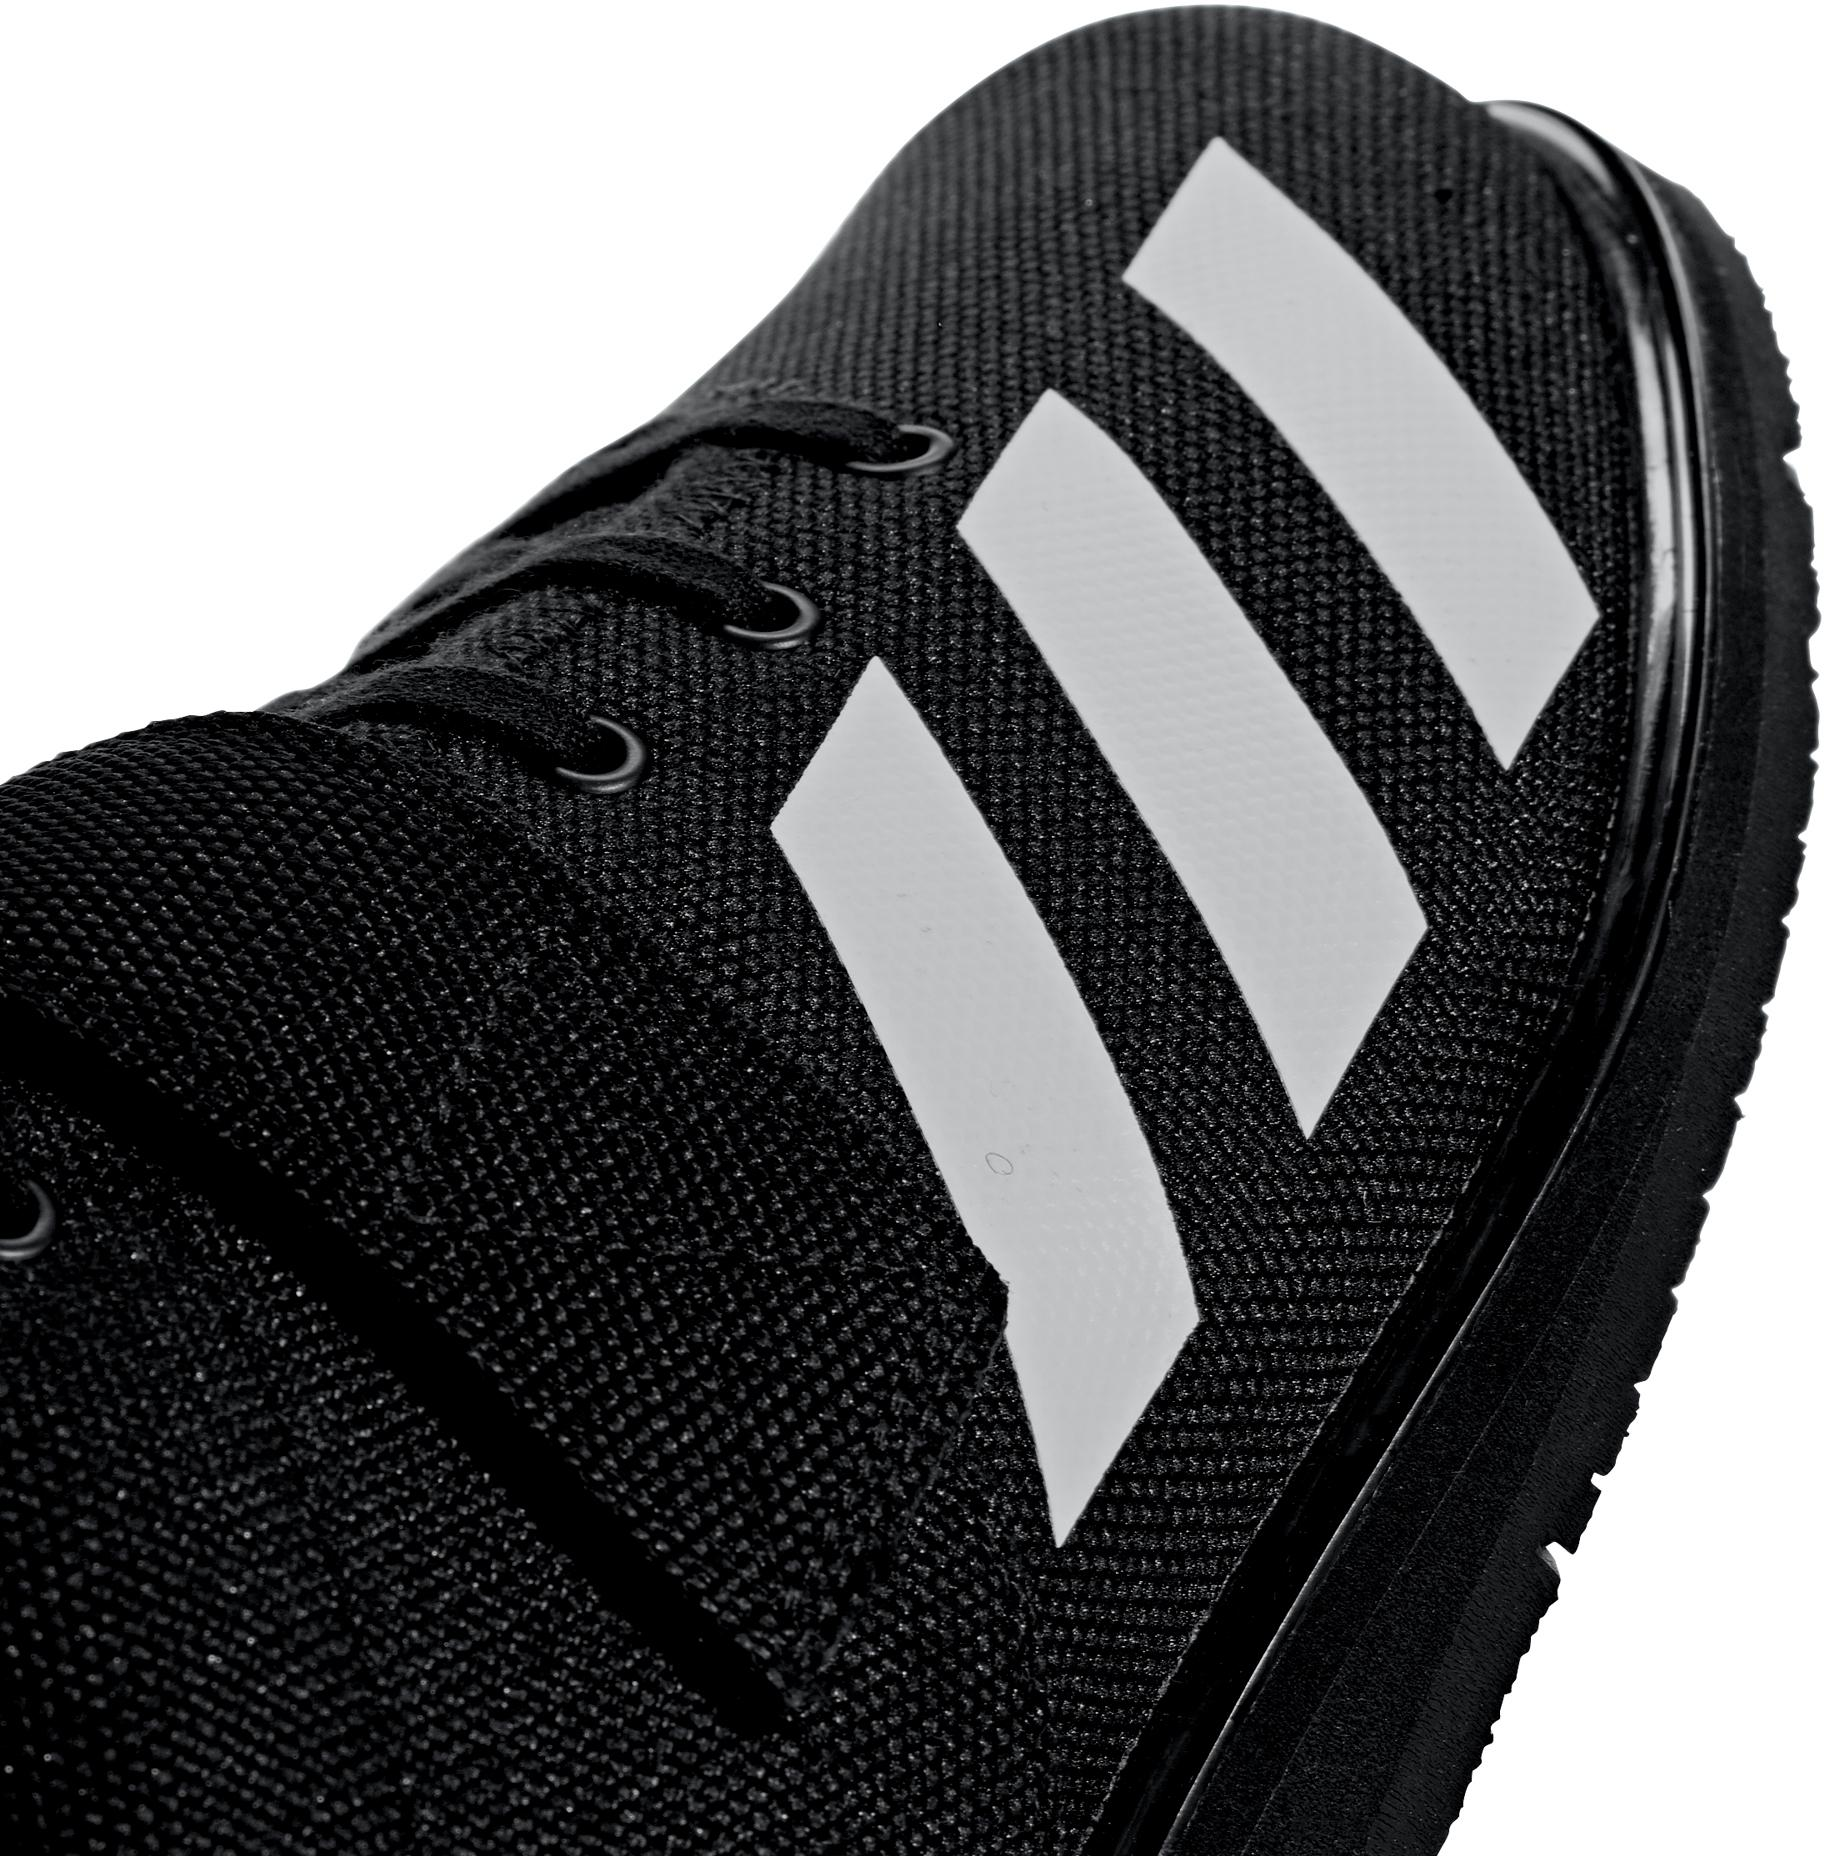 Adidas POWERLIFT 4 Fitnessschuhe Herren raw khaki im Online